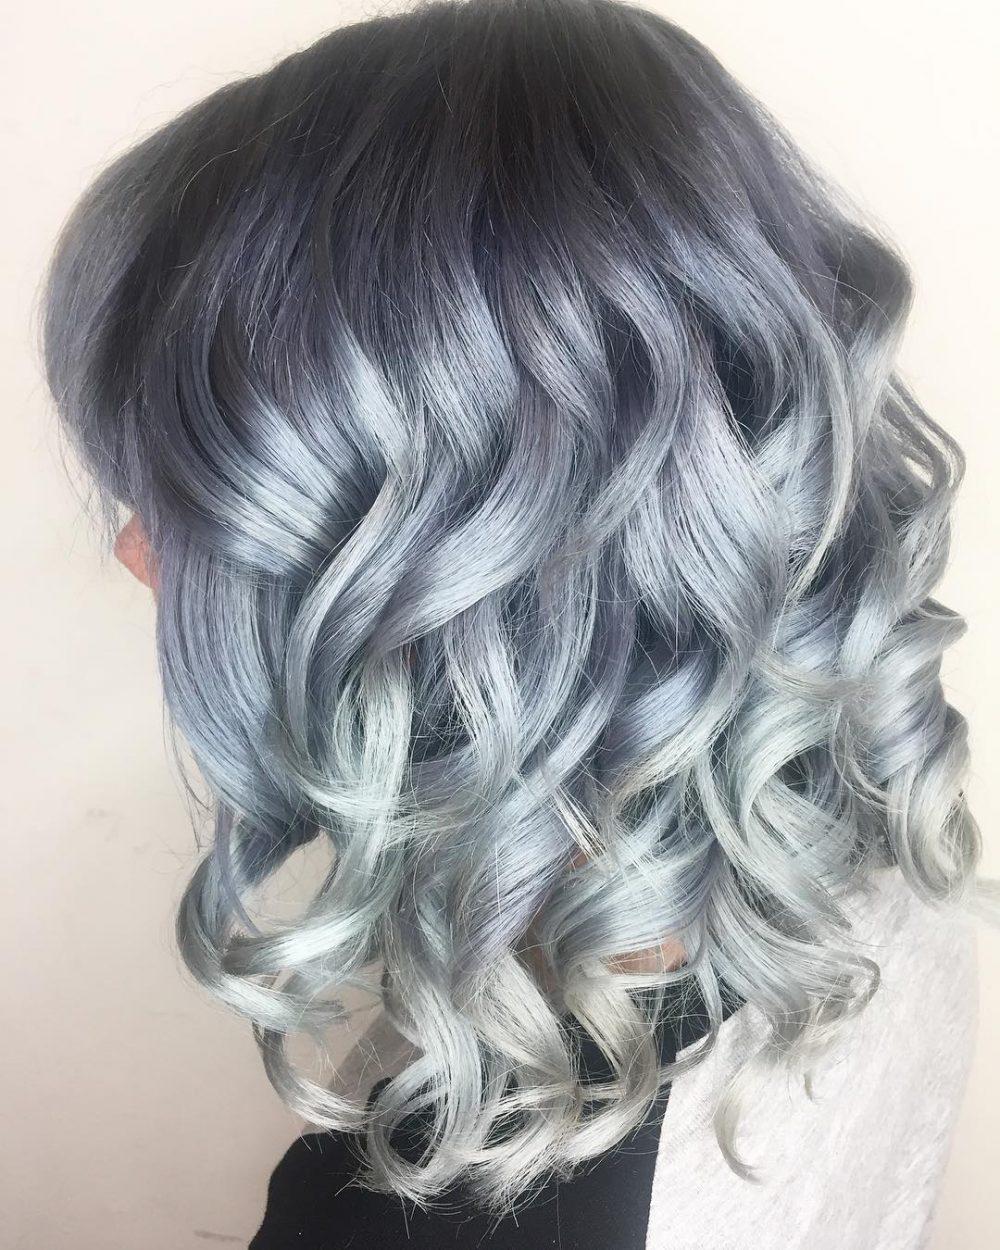 Latest Medium Hairstyle Summer 2018 For Teens 4